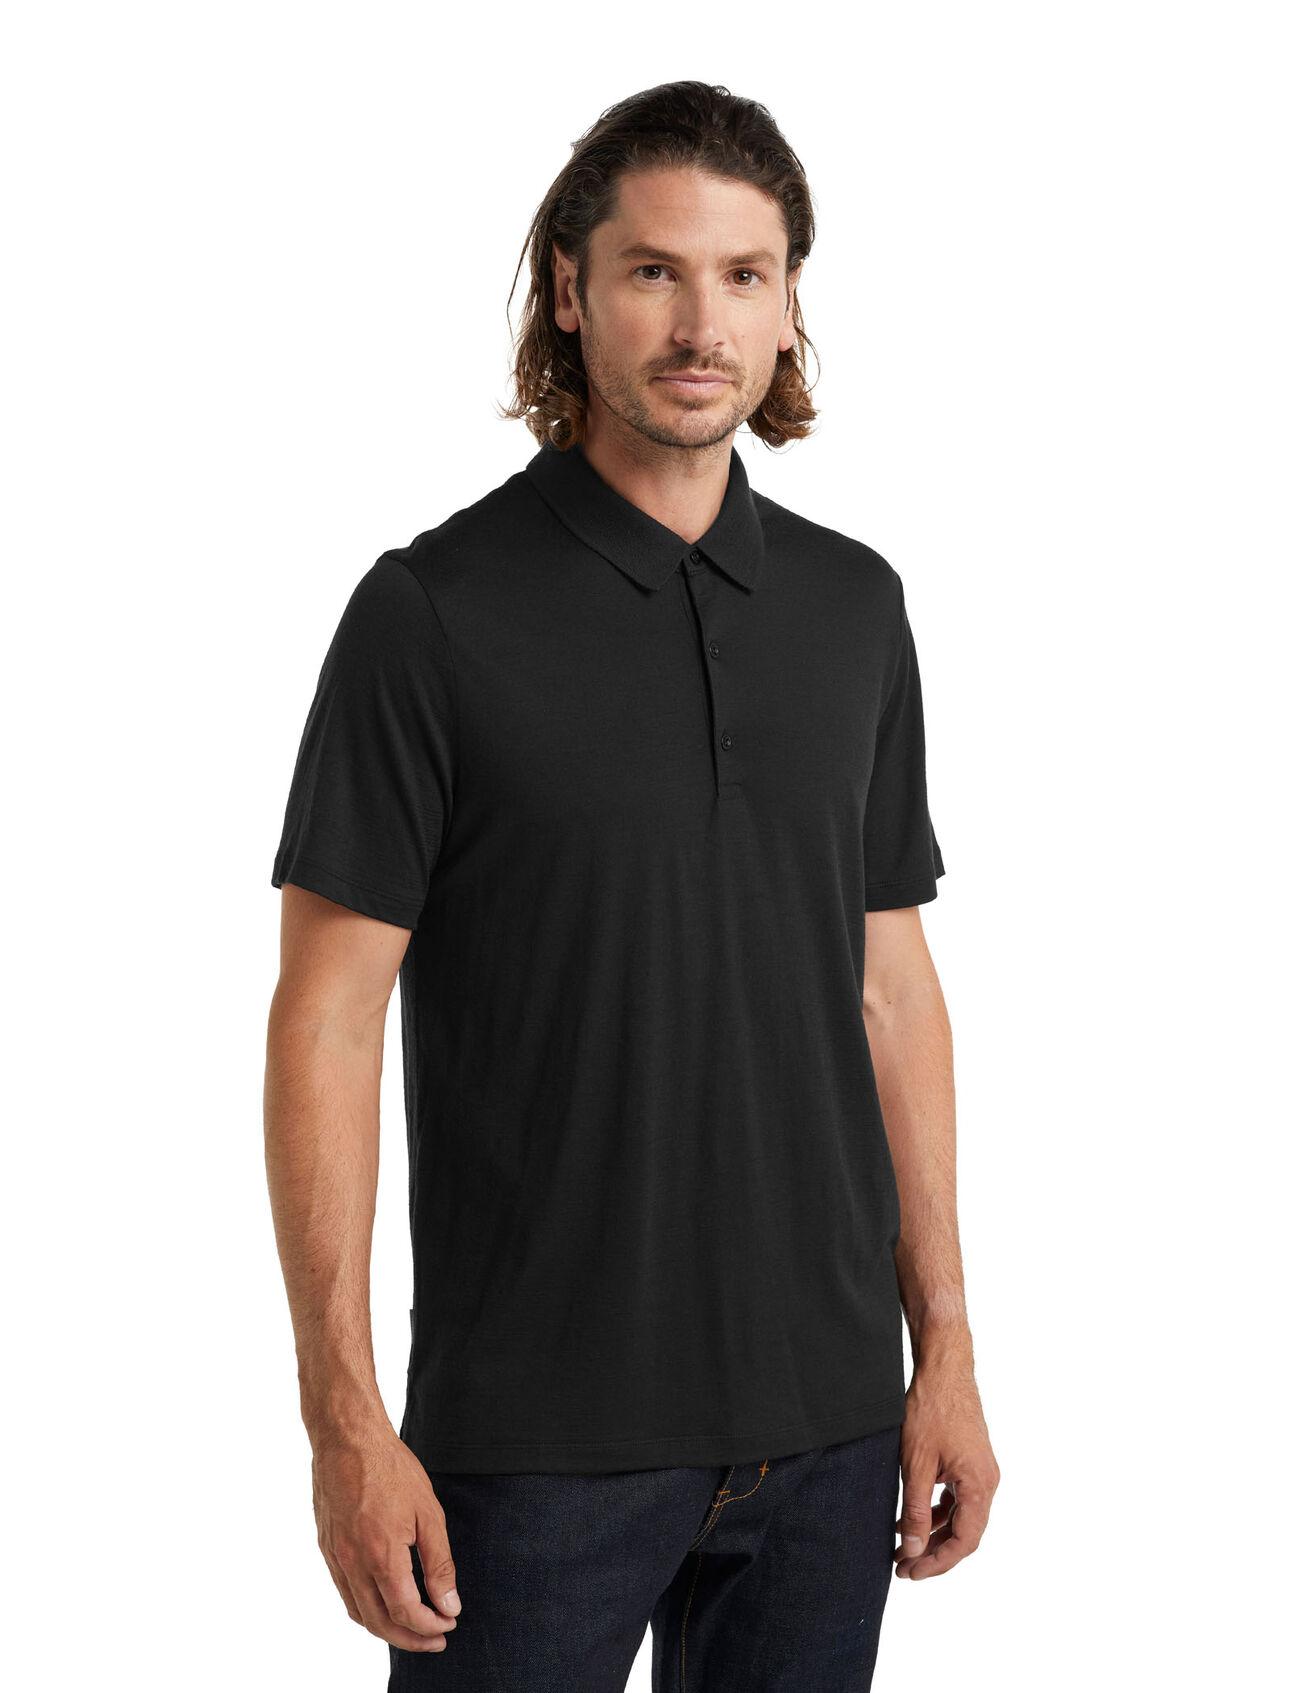 Merino Tech Lite II Short Sleeve Polo Shirt